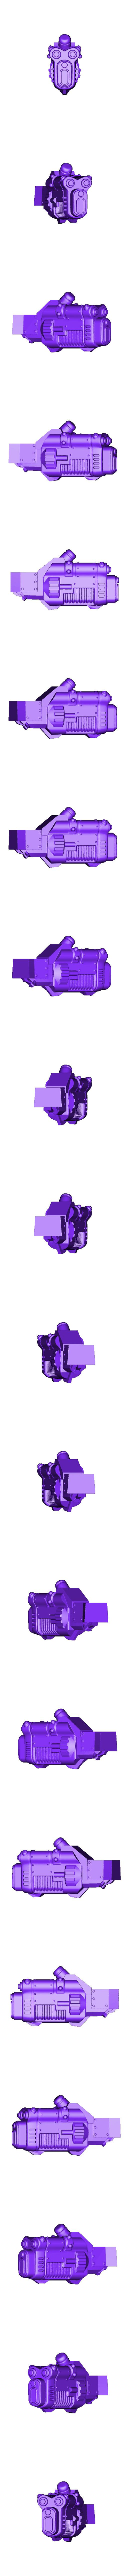 Weapon_03.stl Download STL file ARMED BUNKERS • 3D printer template, Txarli_Factory